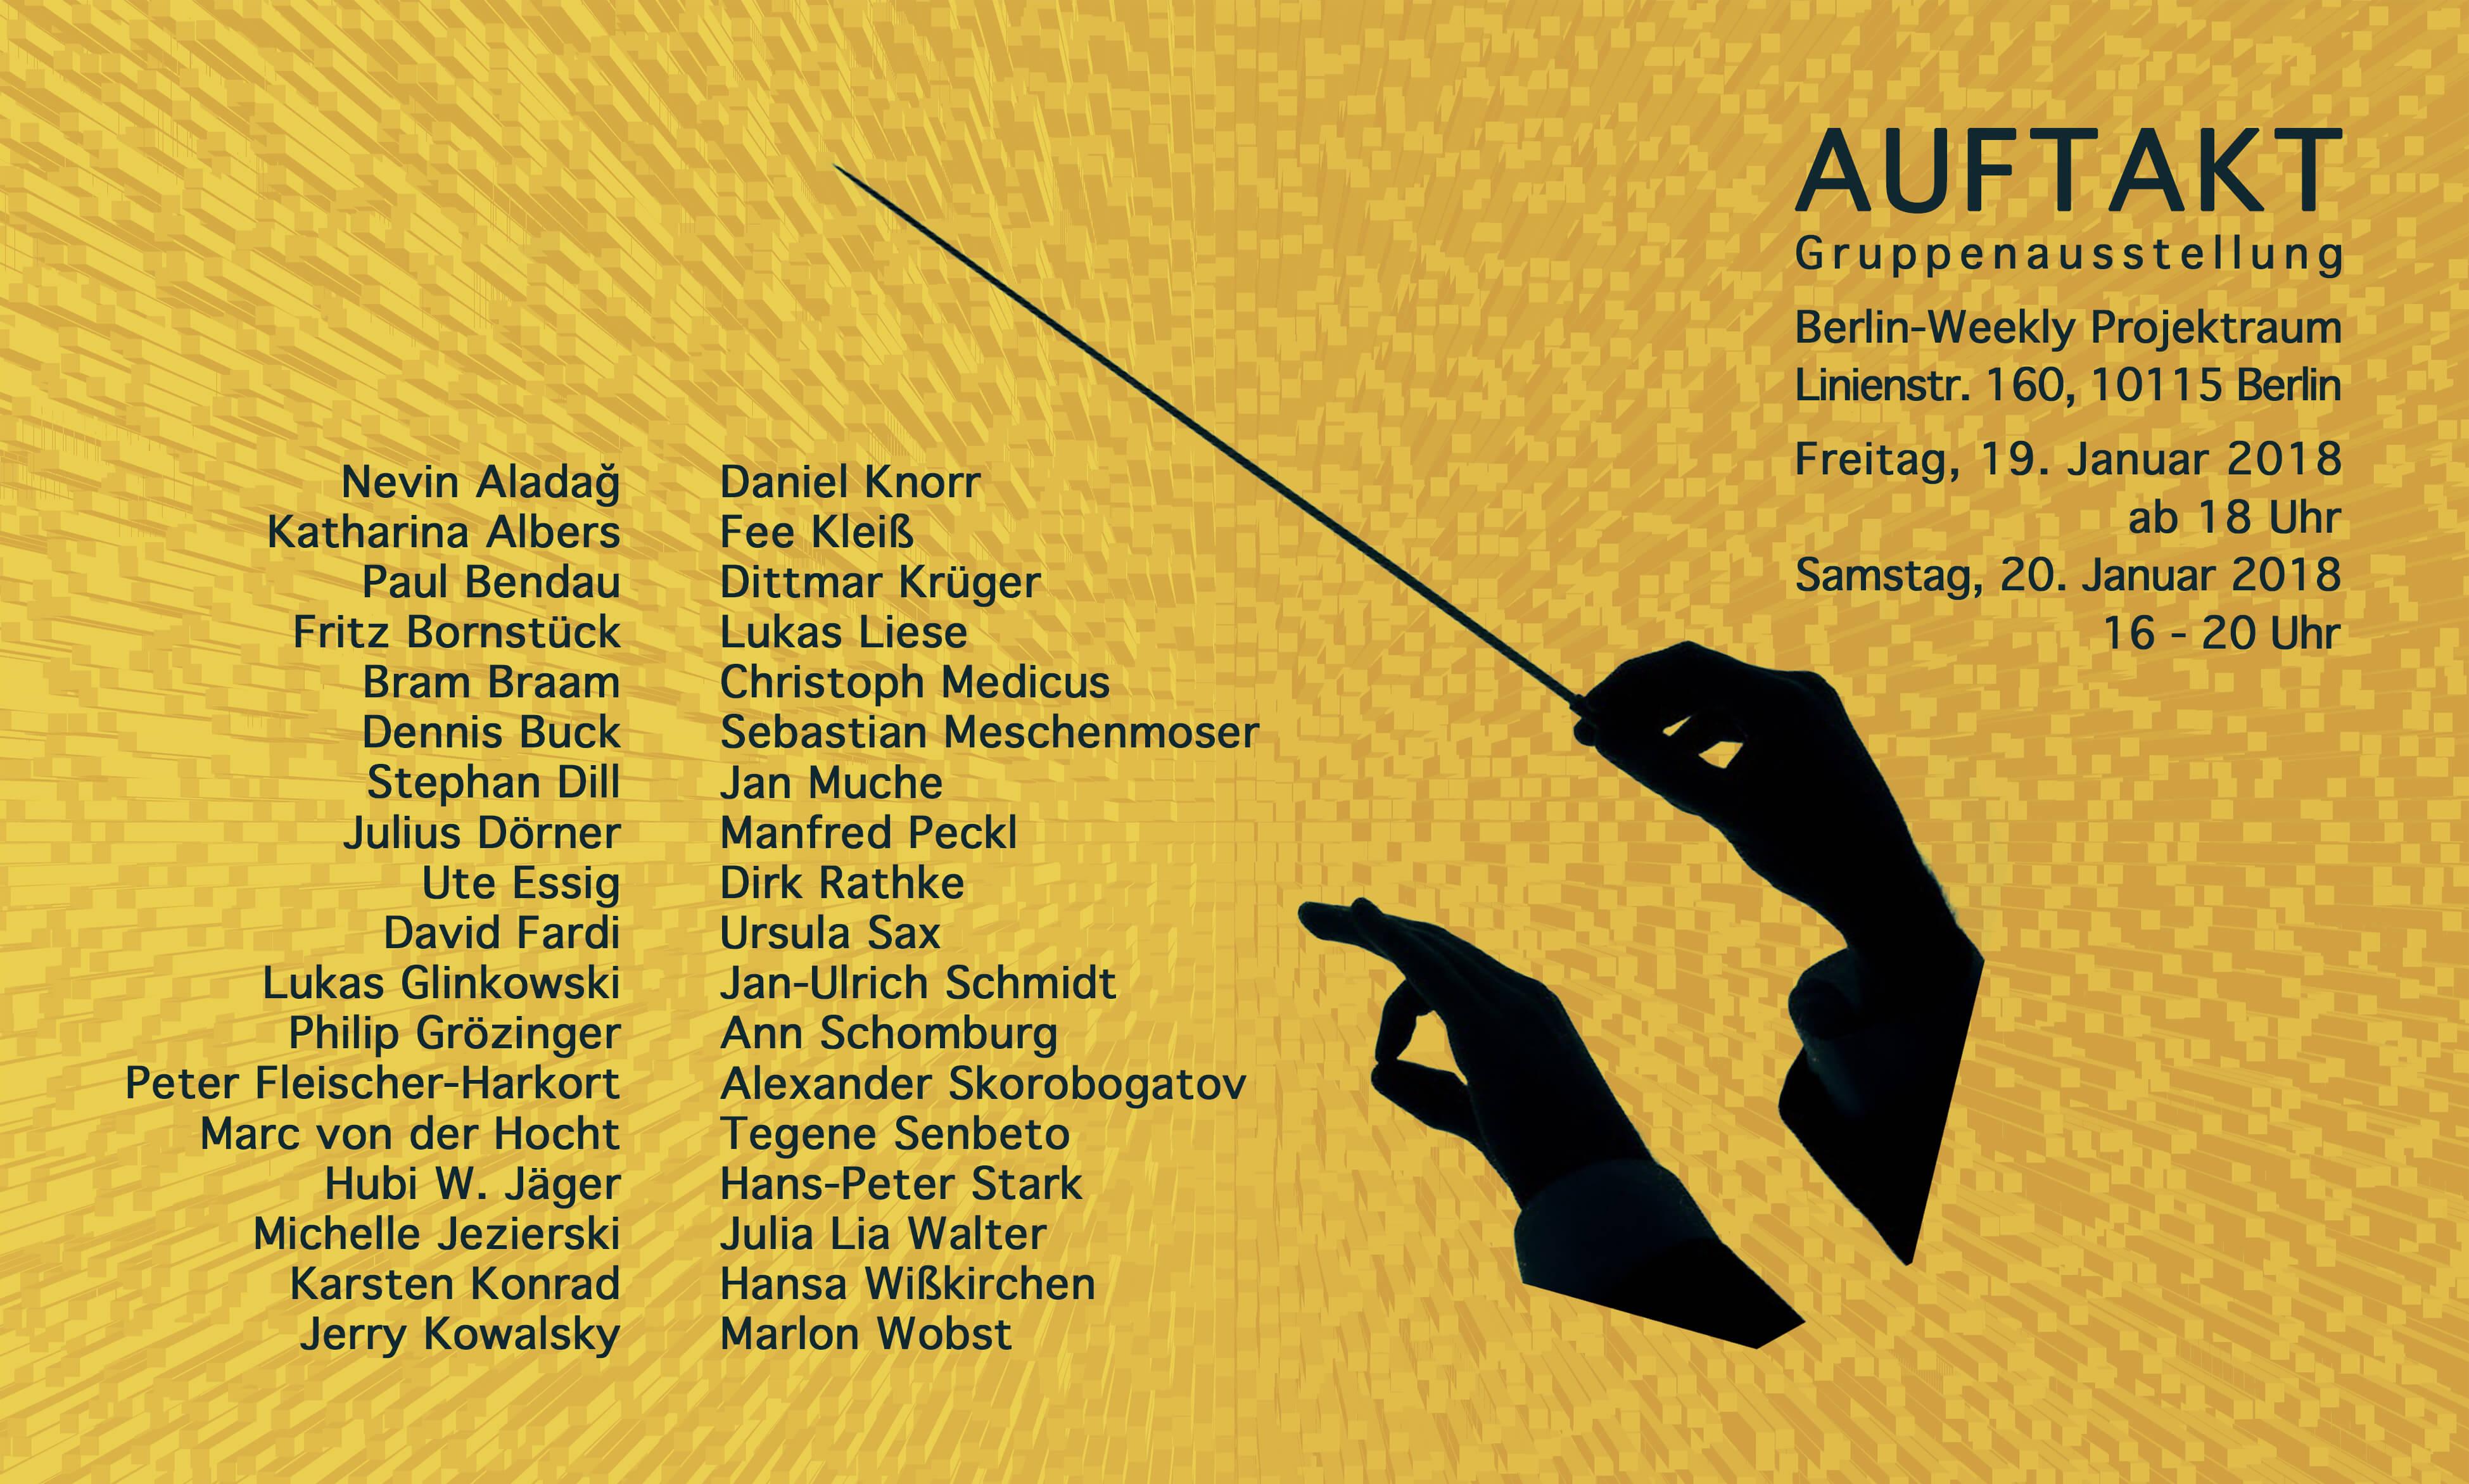 AUFTAKT Gruppenausstellung // Berlin-Weekly Projektraum